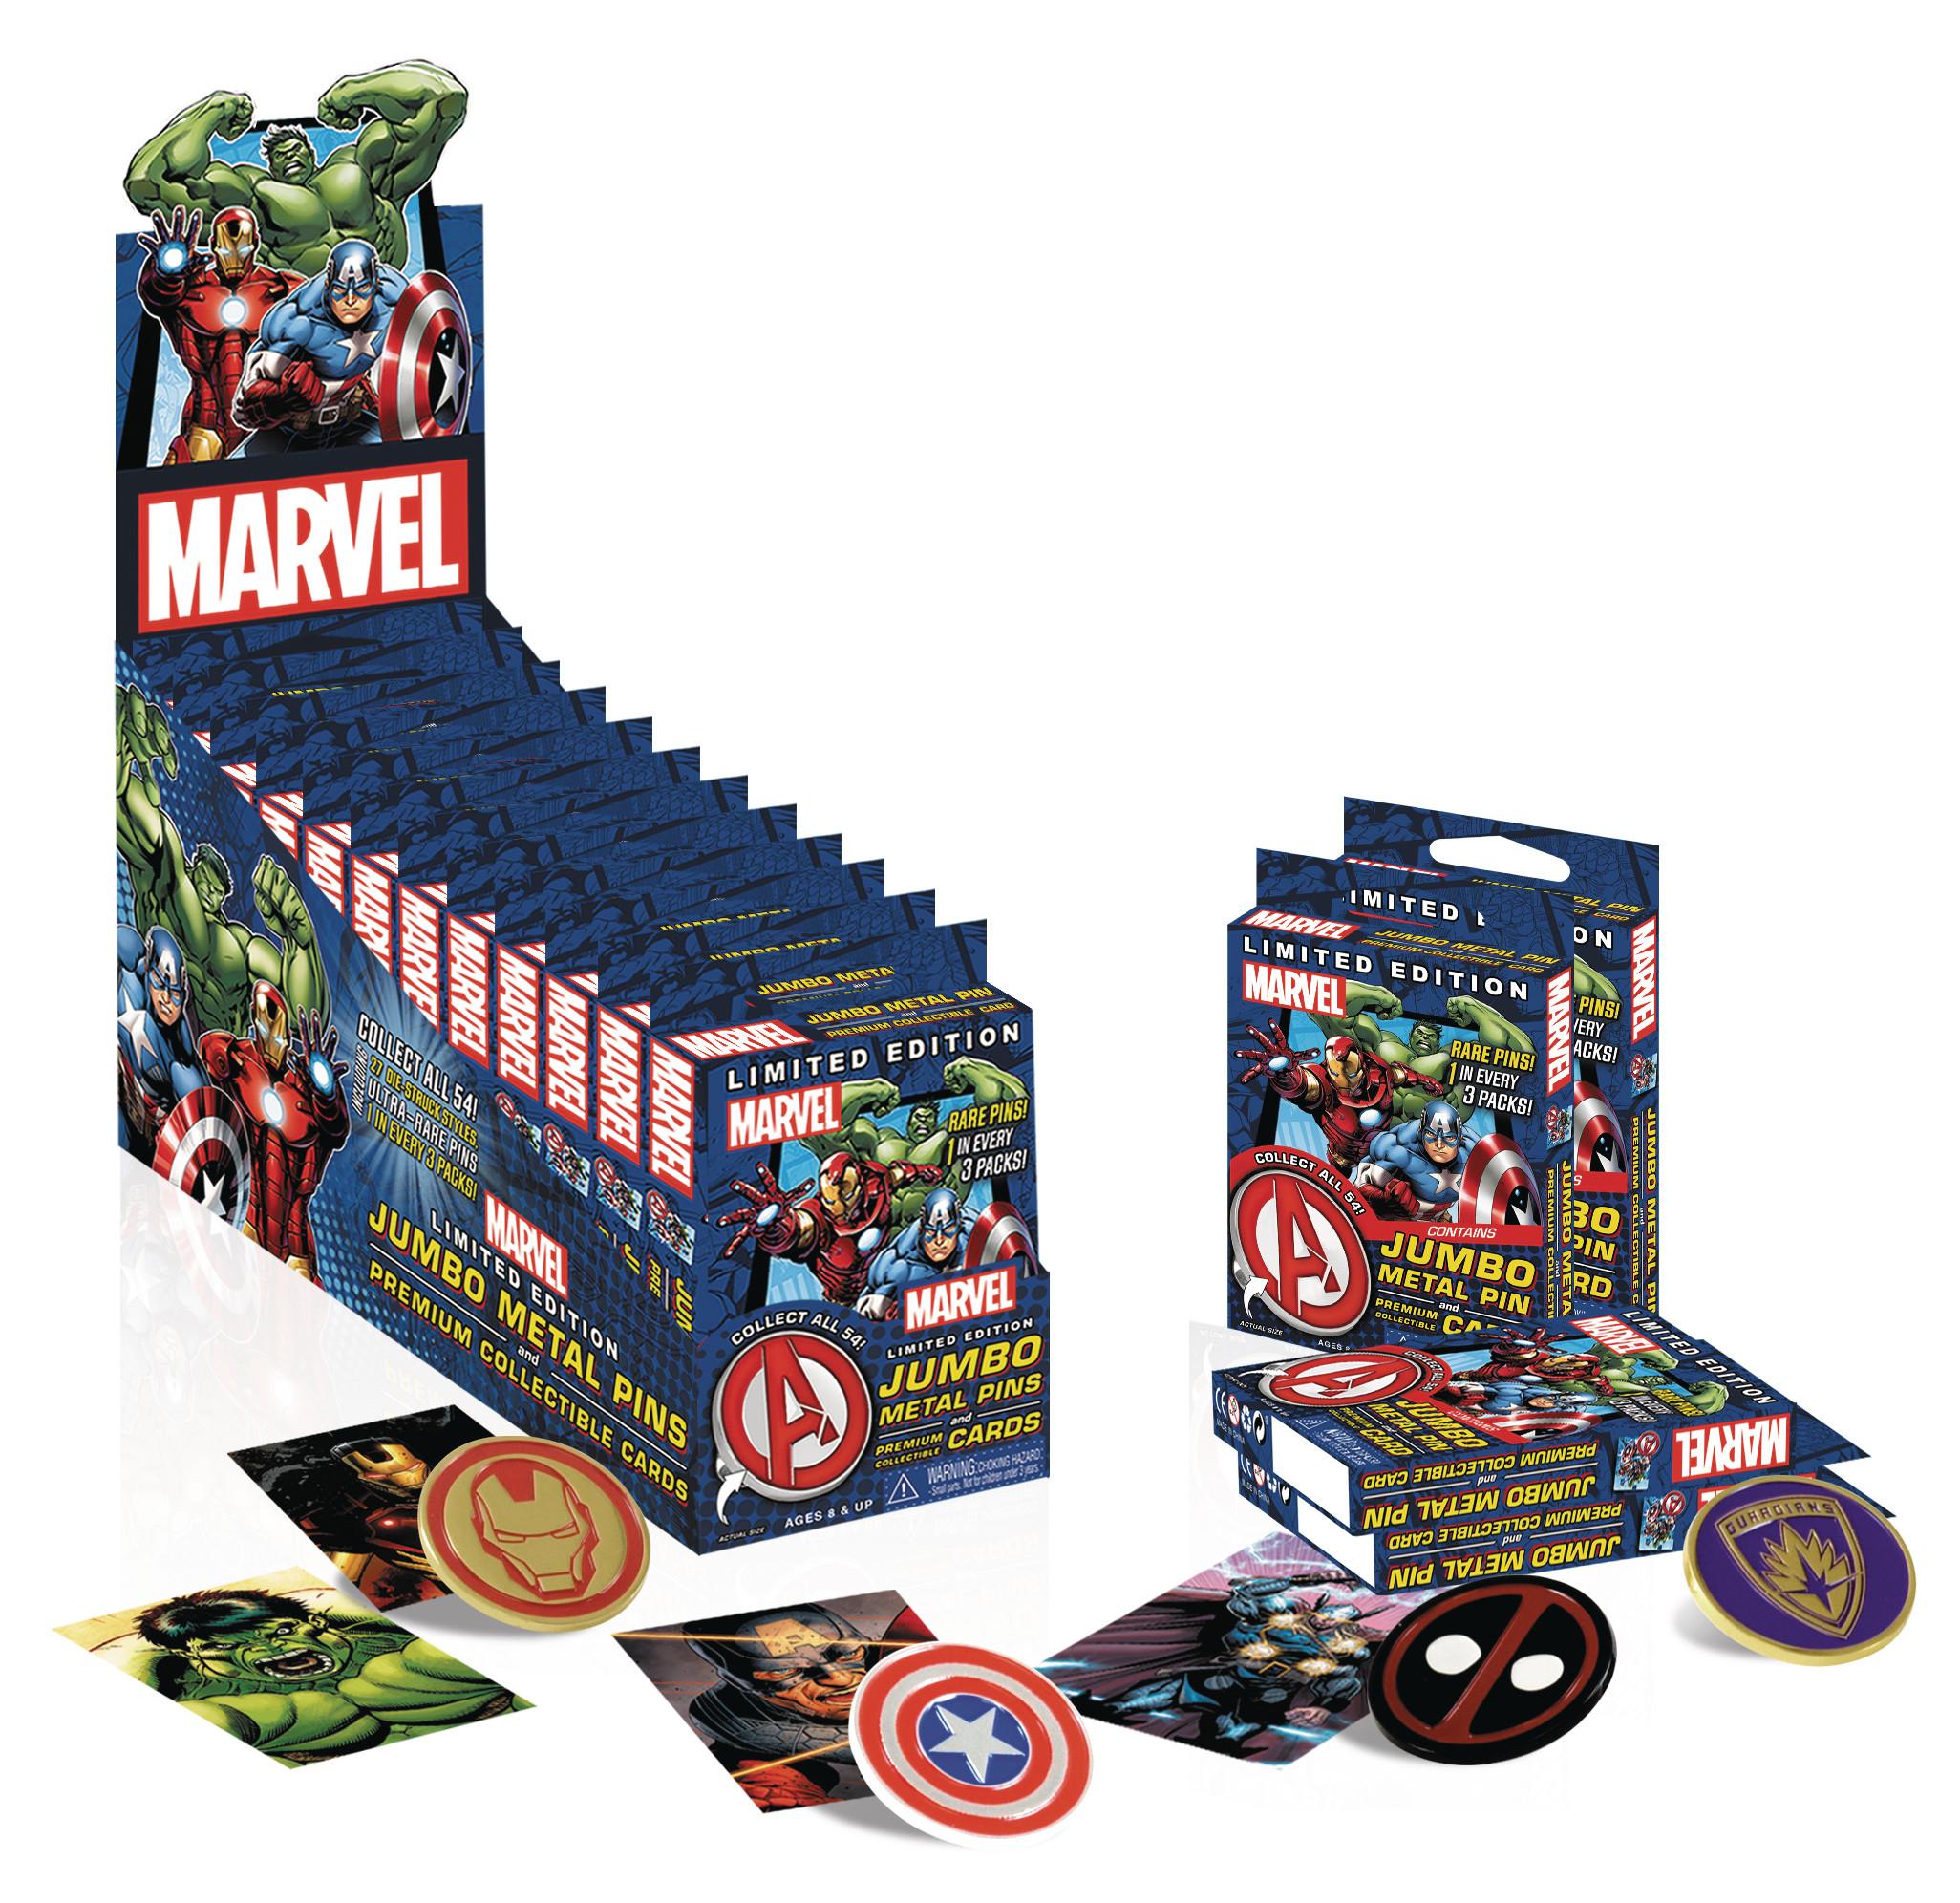 Marvel Pins  FEB MARVEL LTD ED METAL PINS & PREMIUM COLL CARDS